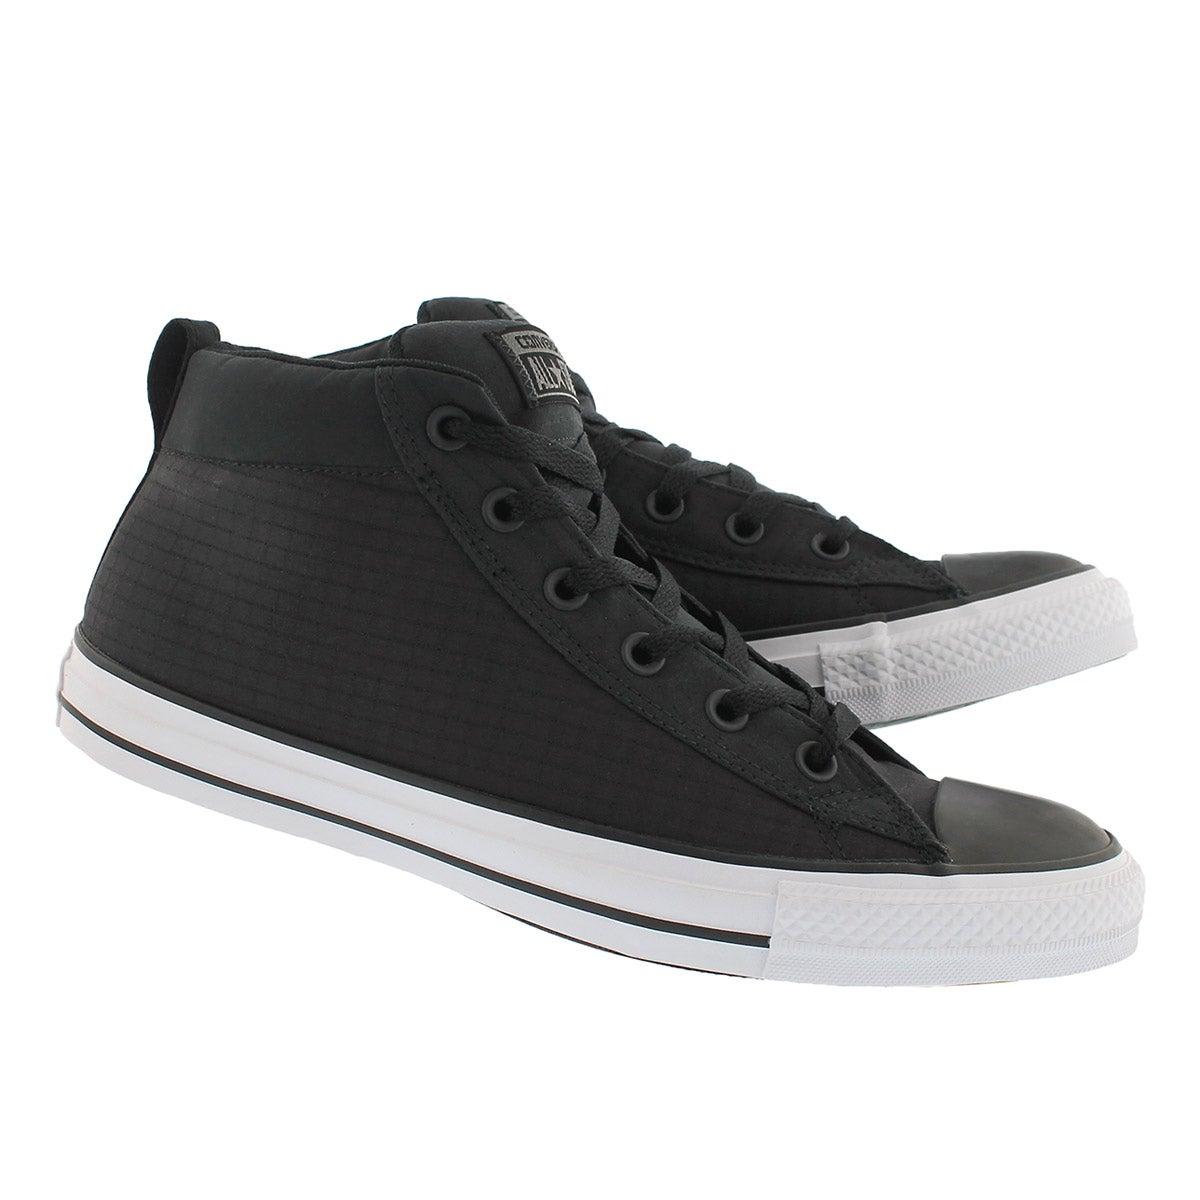 Mns CT A/S Street black/wht sneaker